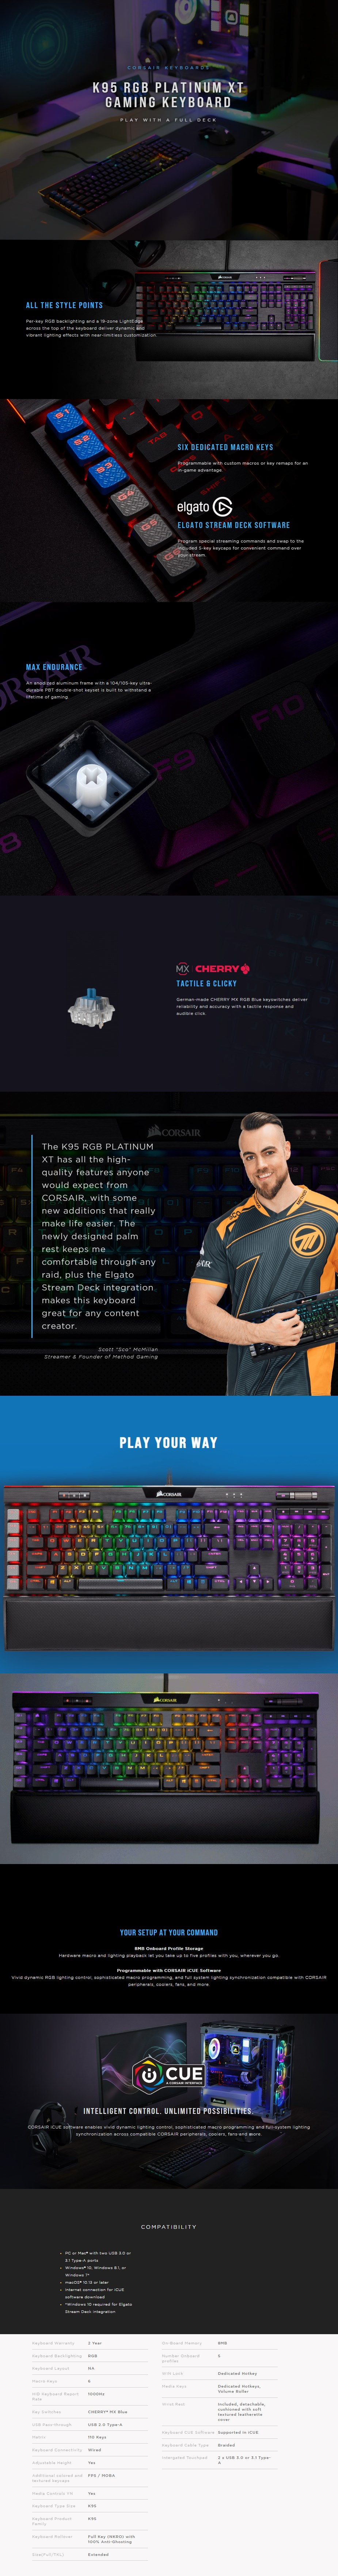 Corsair K95 RGB Platinum XT Mechanical Gaming Keyboard - Cherry MX Blue - Overview 1